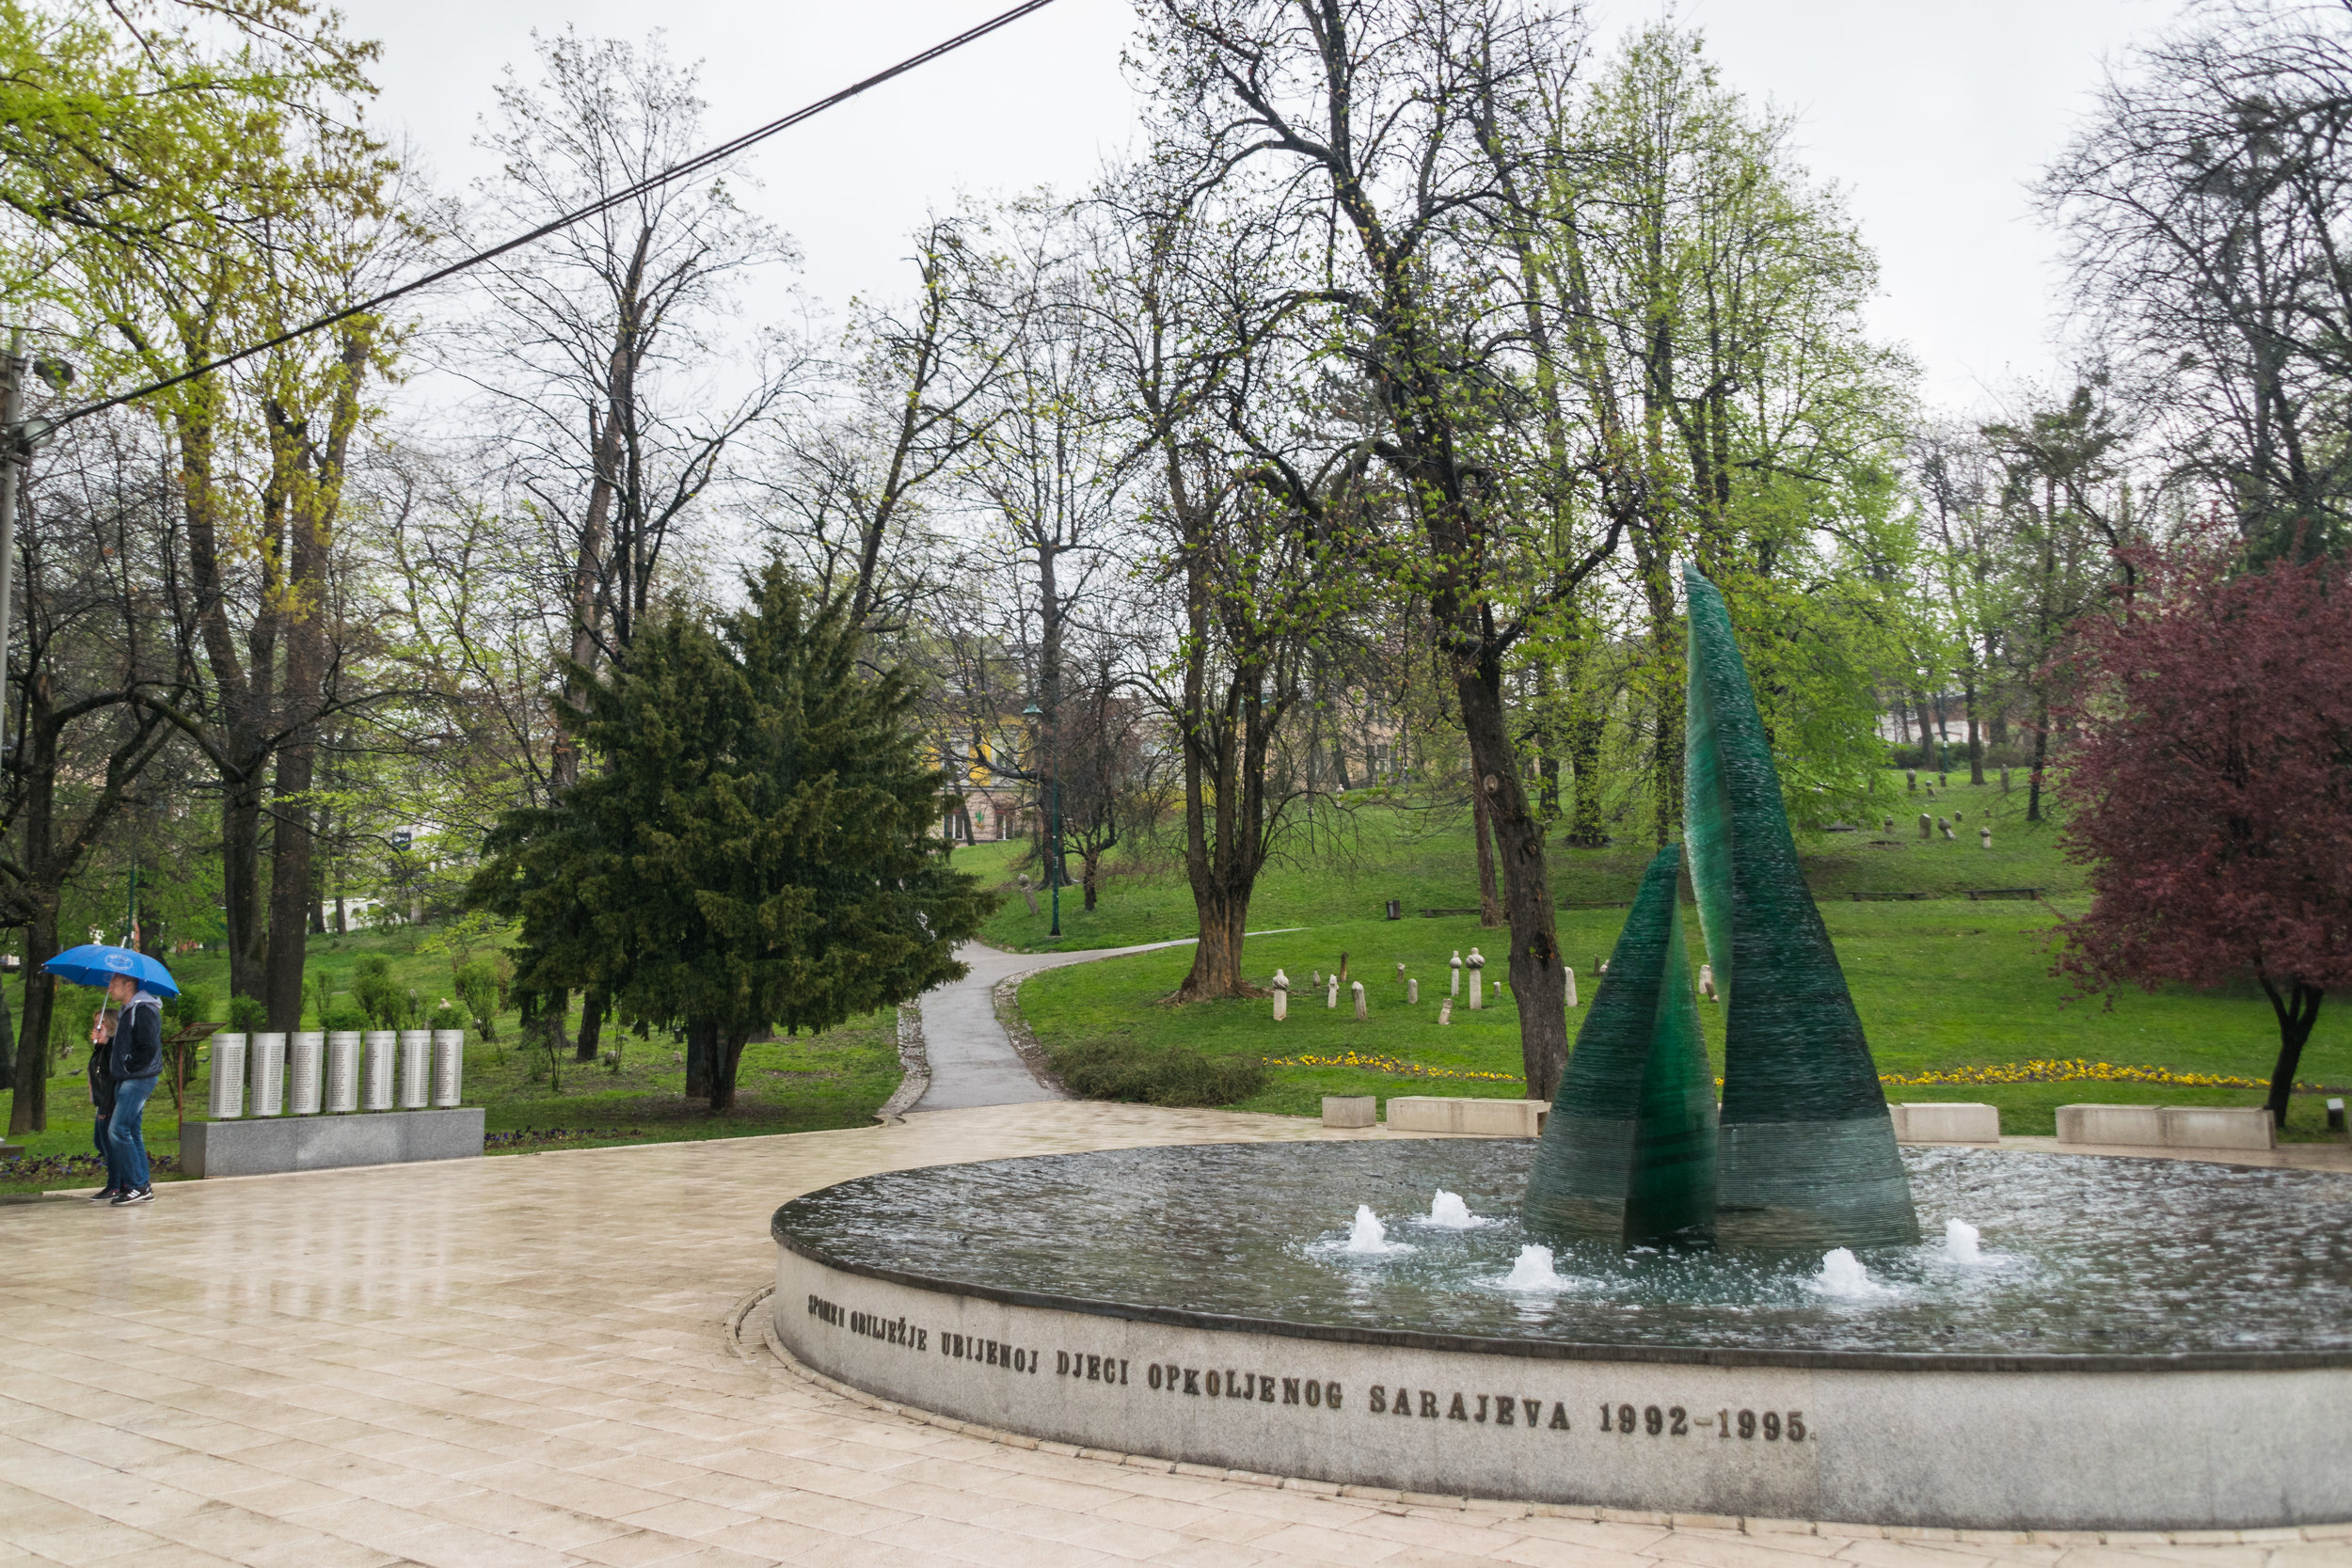 memorial to Sarajevo children killed during the siege